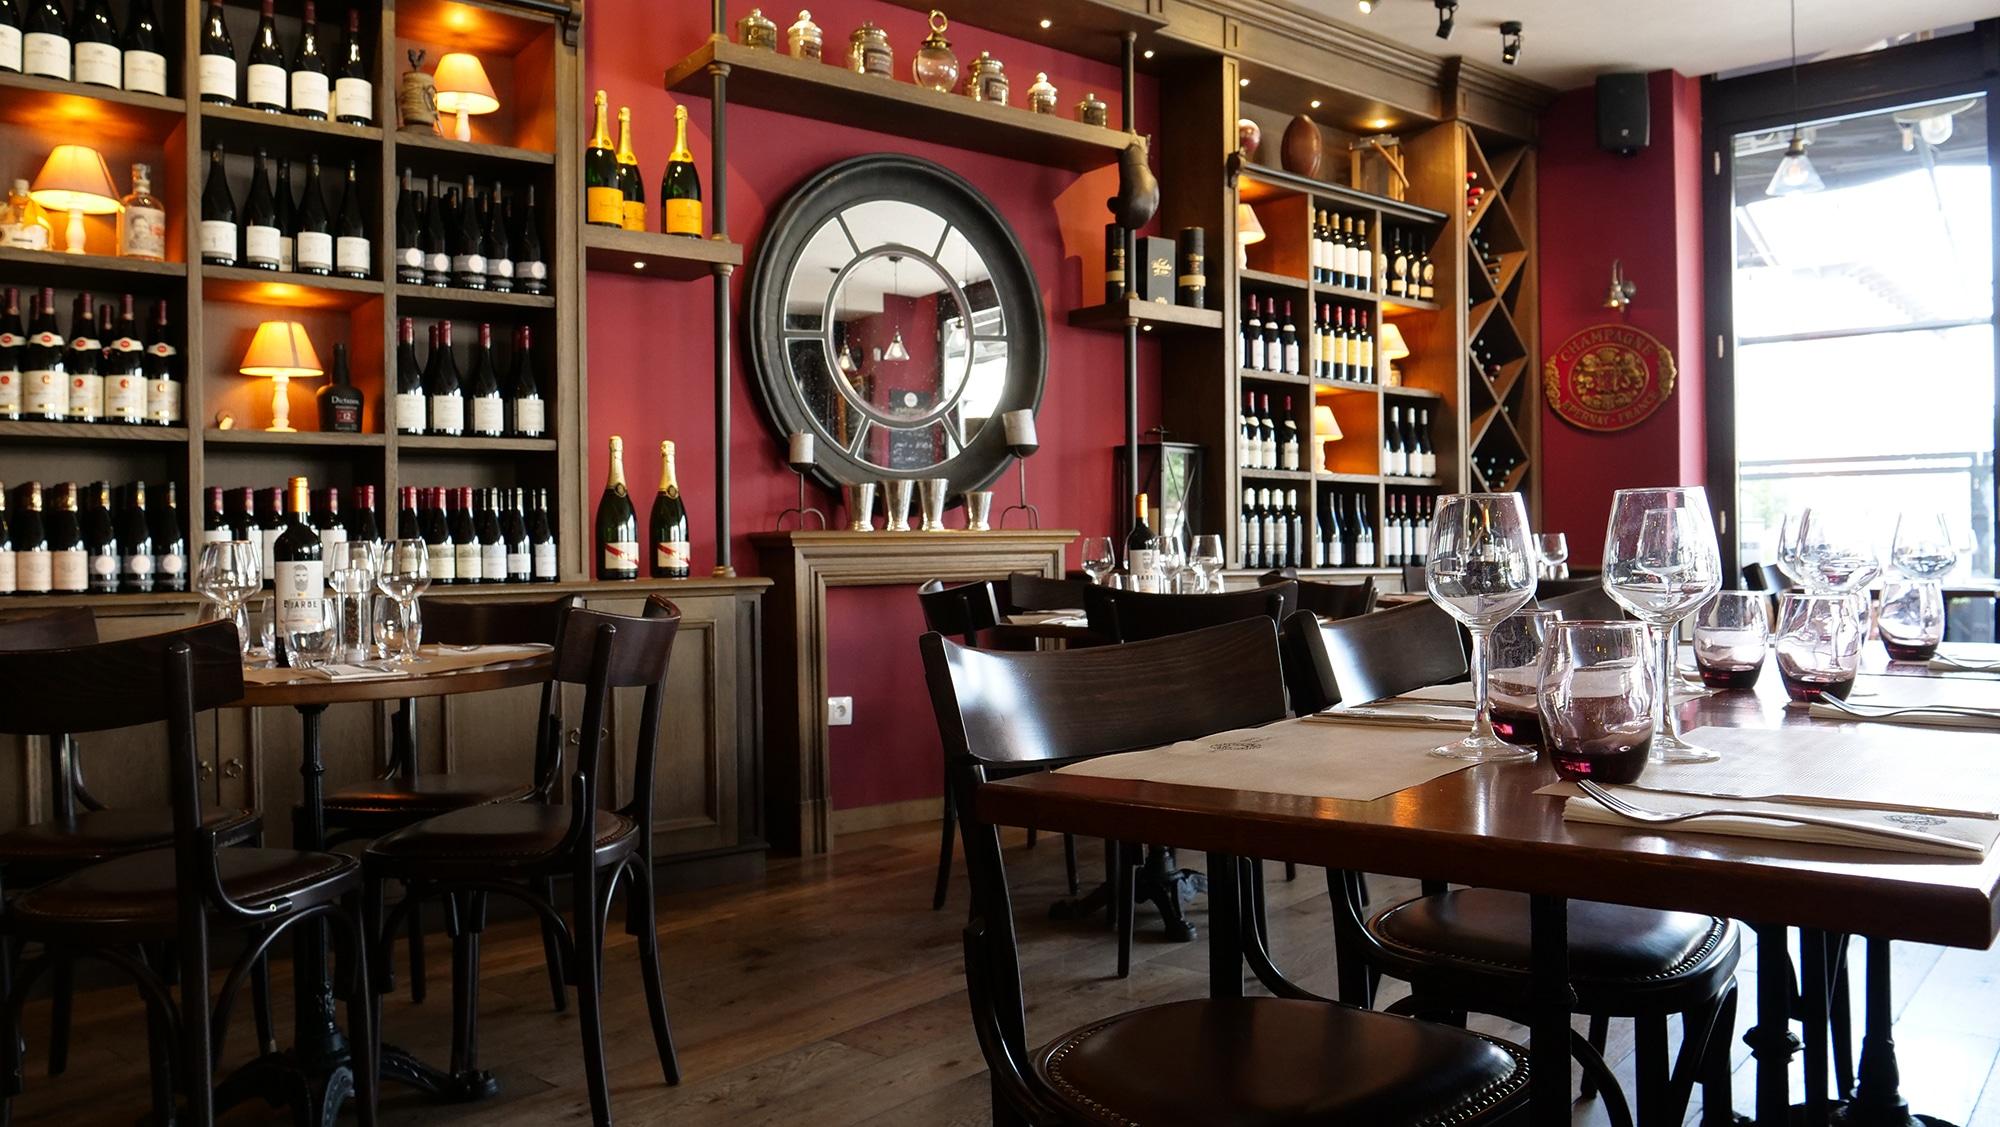 le grey sud brasserie traditionnelle massy restaurant. Black Bedroom Furniture Sets. Home Design Ideas